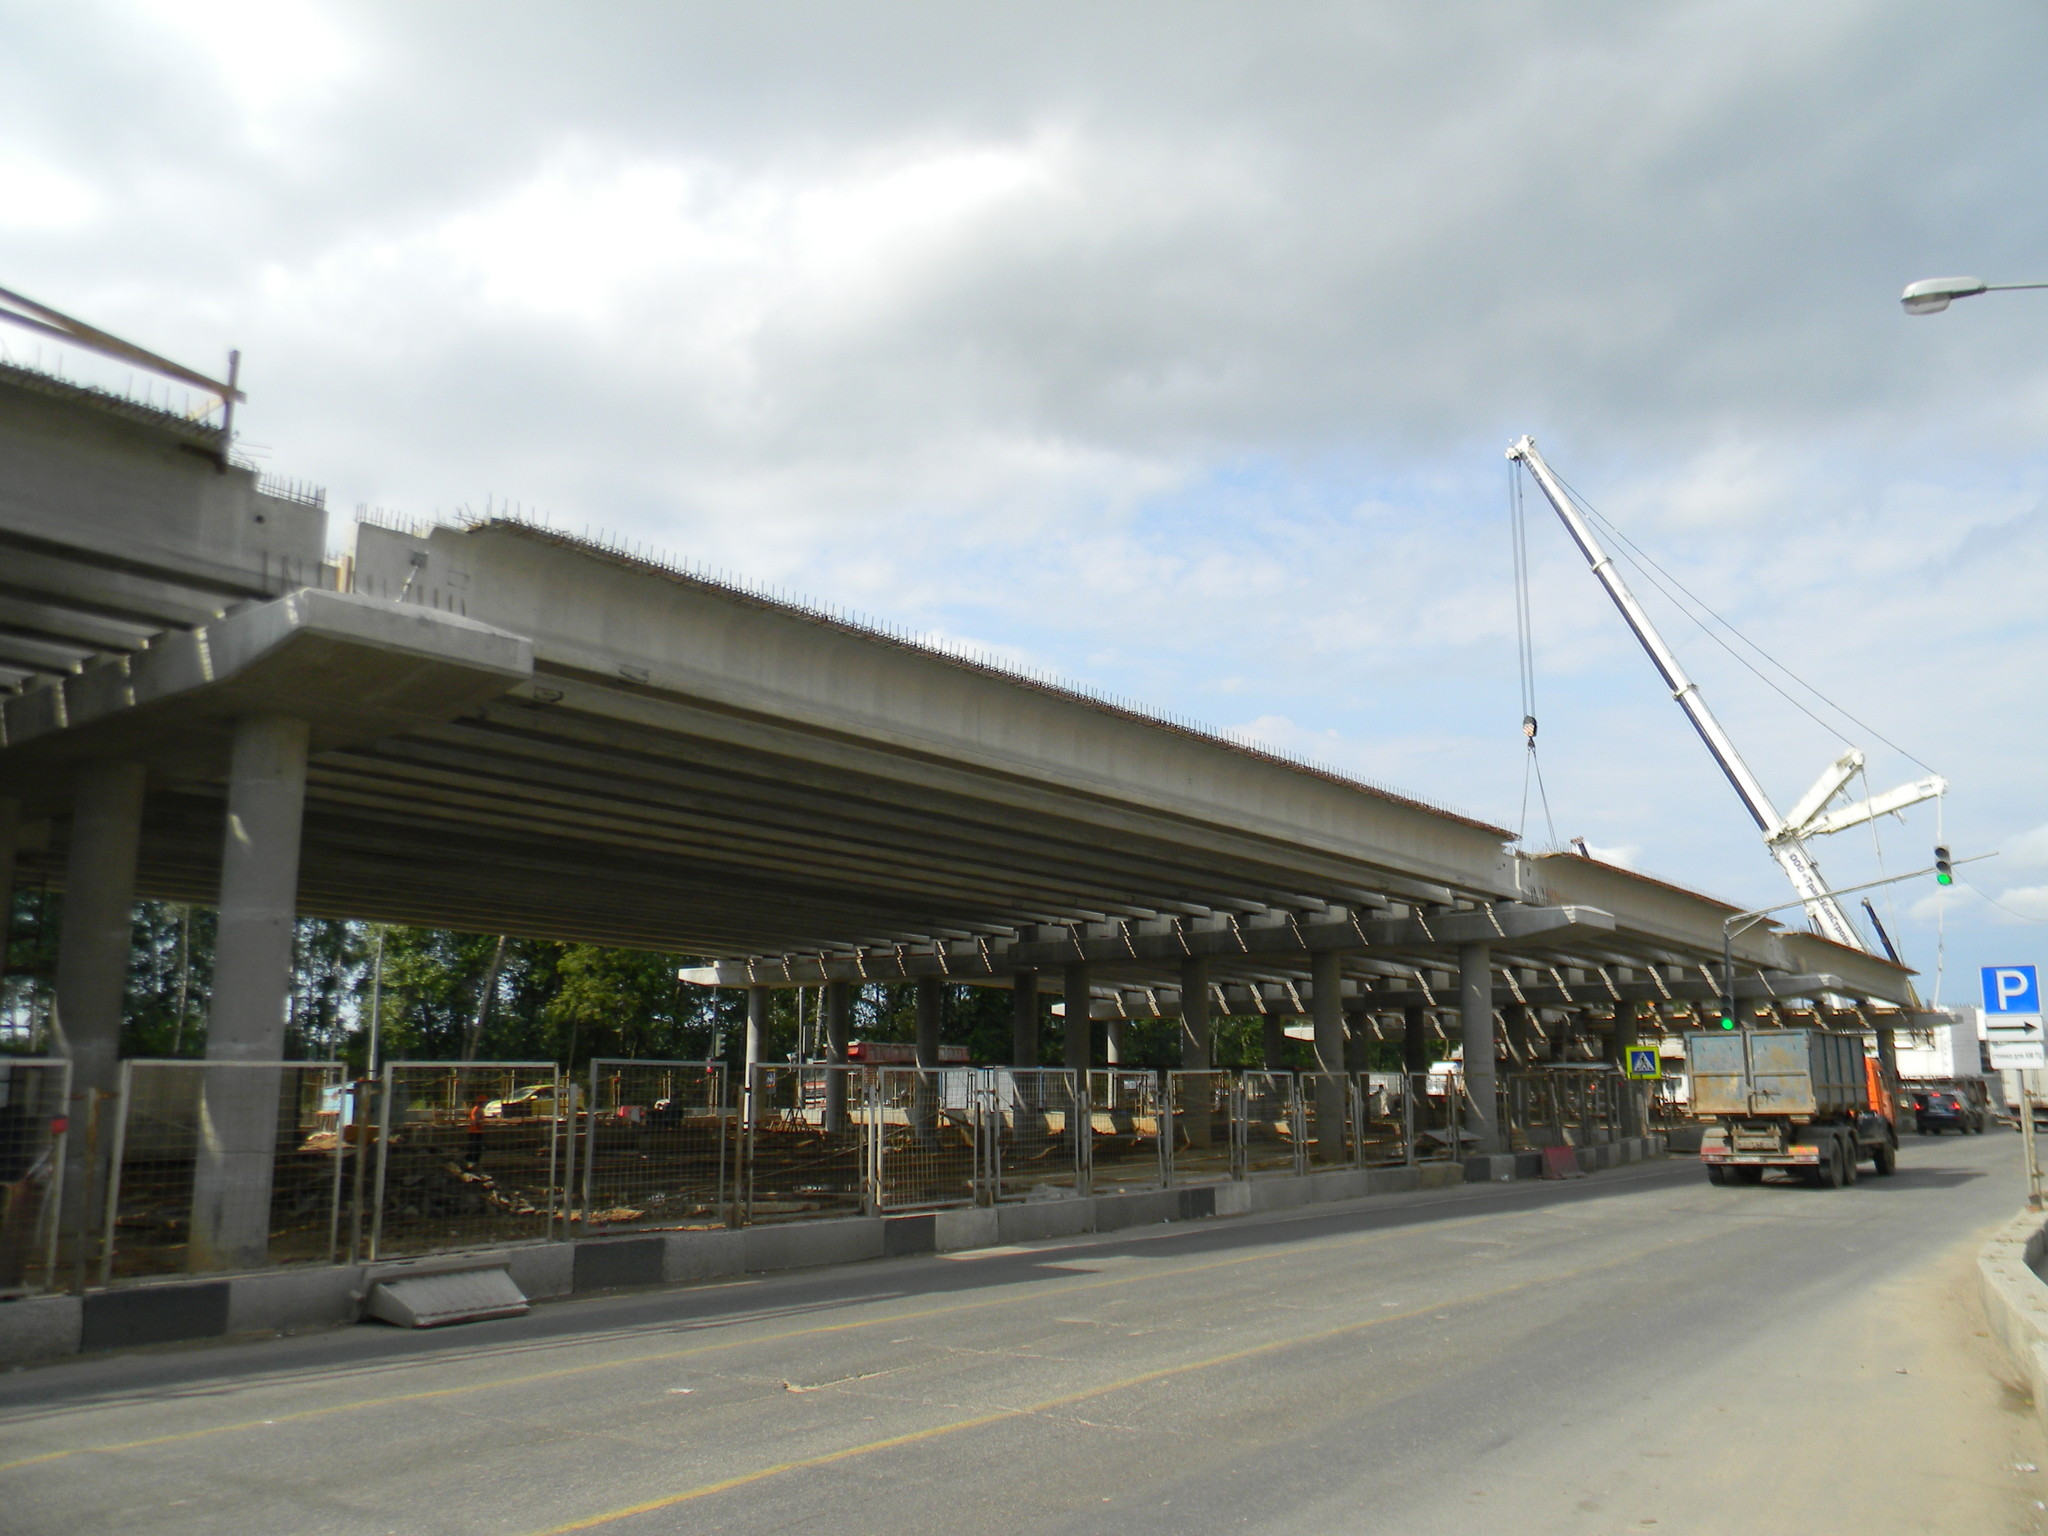 Строительство развязки на Дмитровском шоссе в 4-м микрорайоне Северного